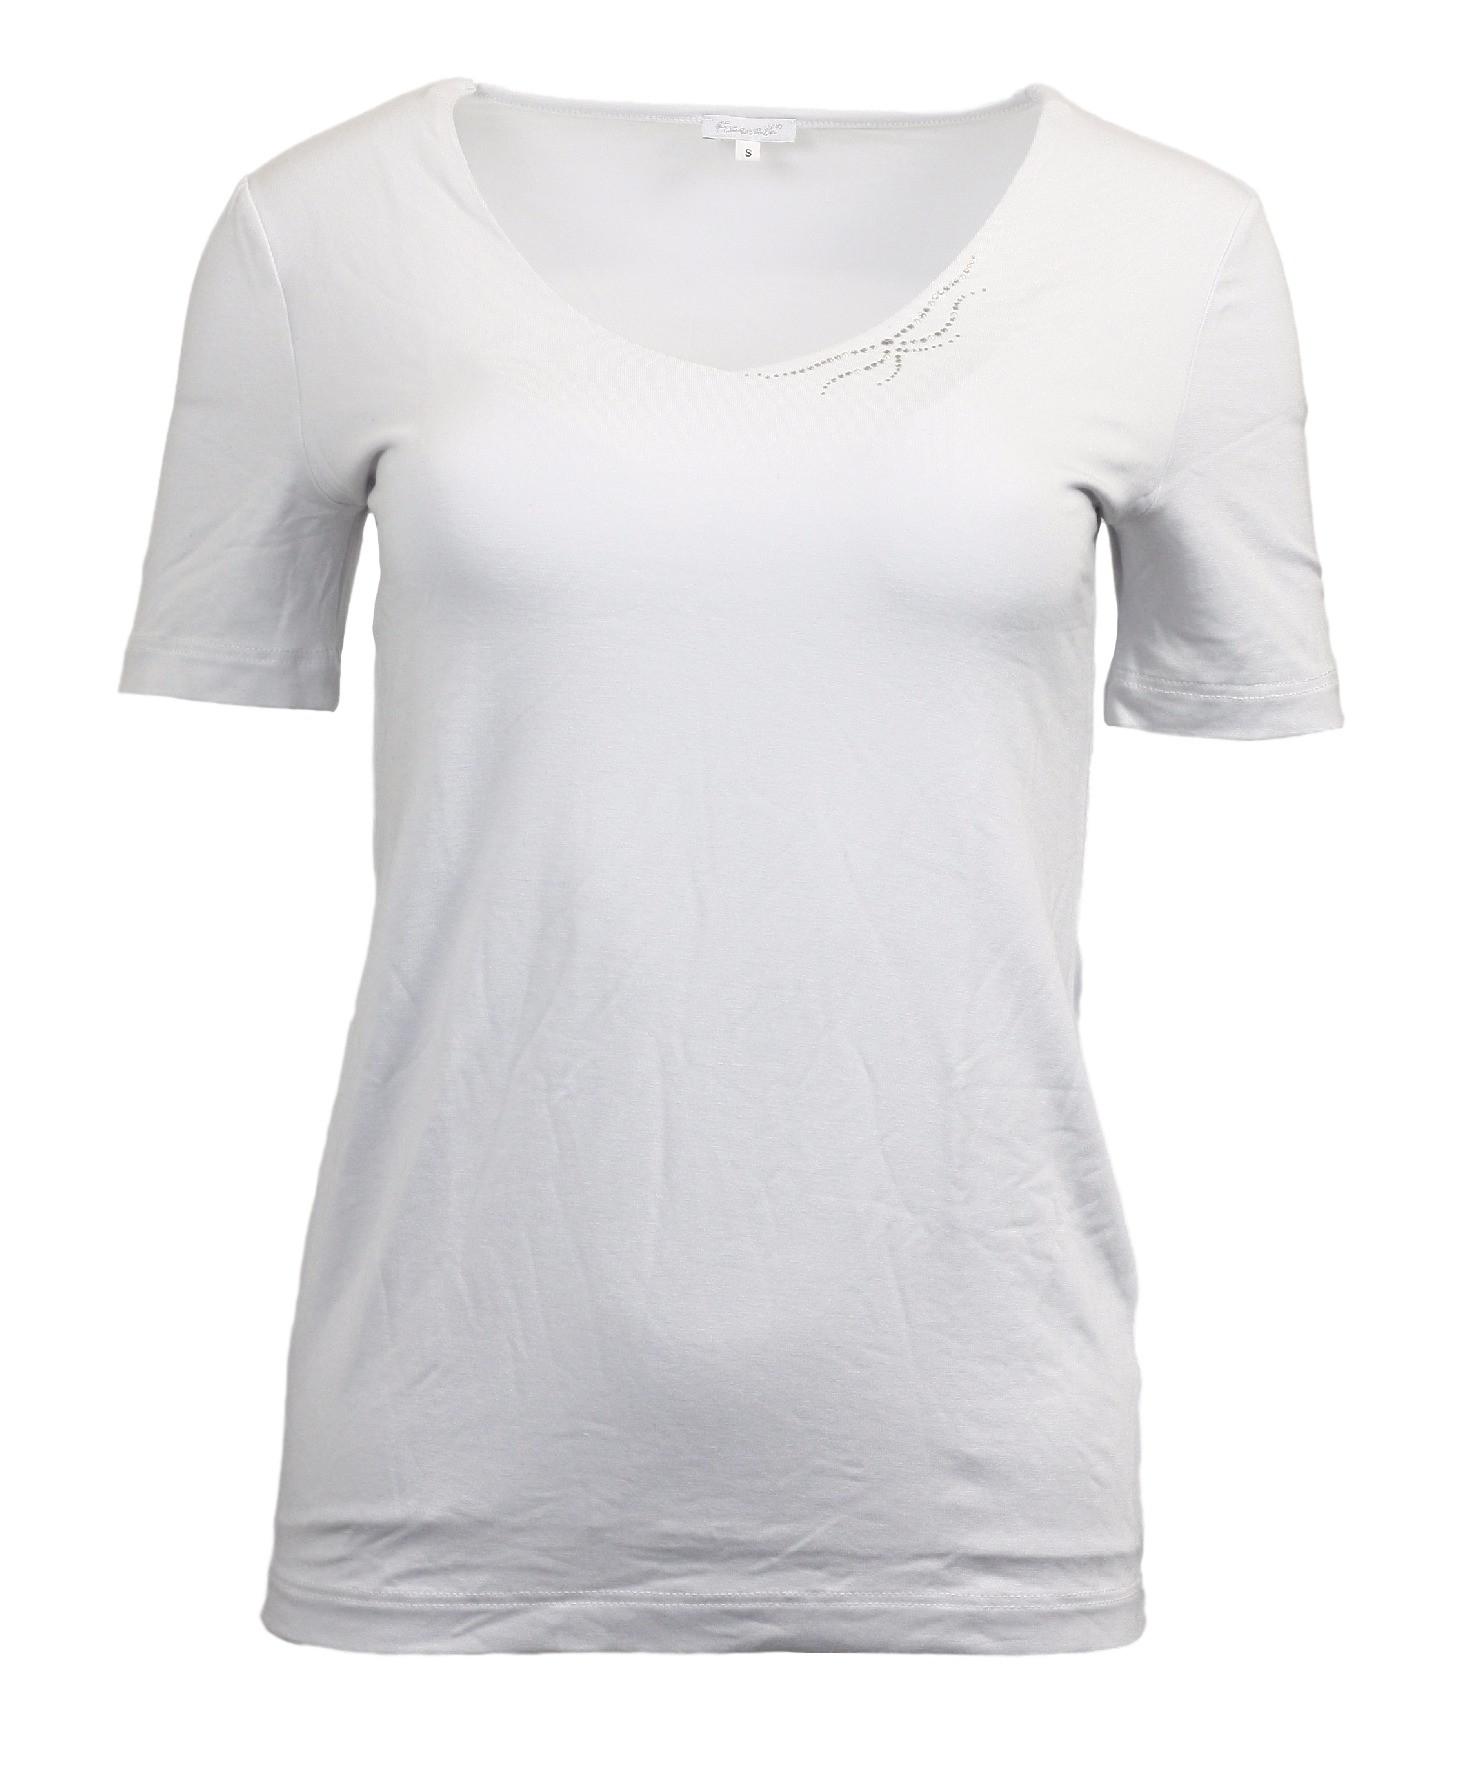 Dámské tričko Linaka kr - Favab - Bílá/L